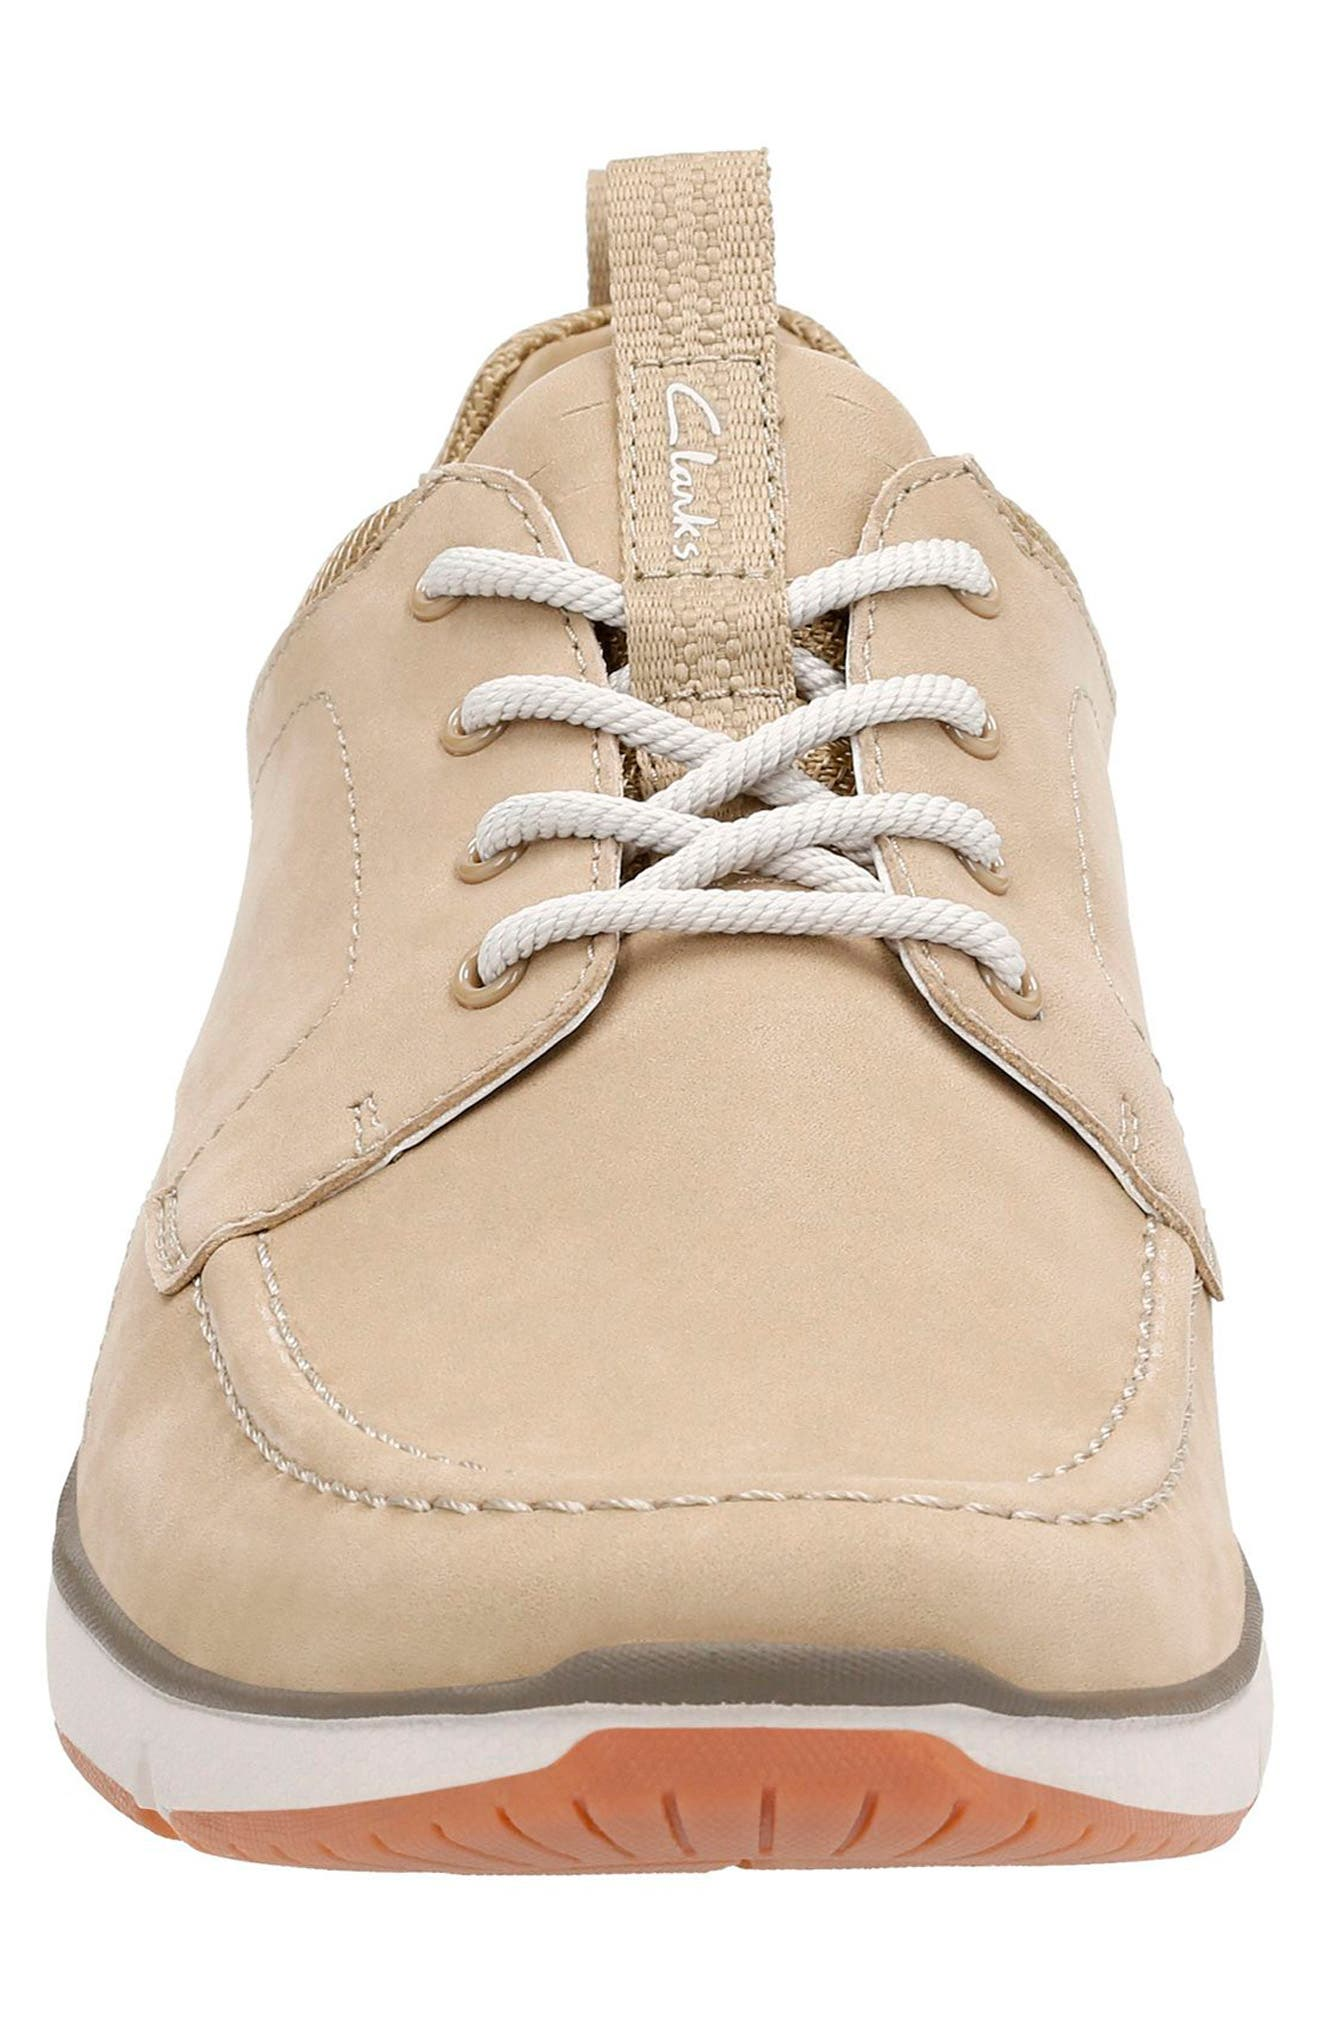 Orson Bay Sneaker,                             Alternate thumbnail 4, color,                             200